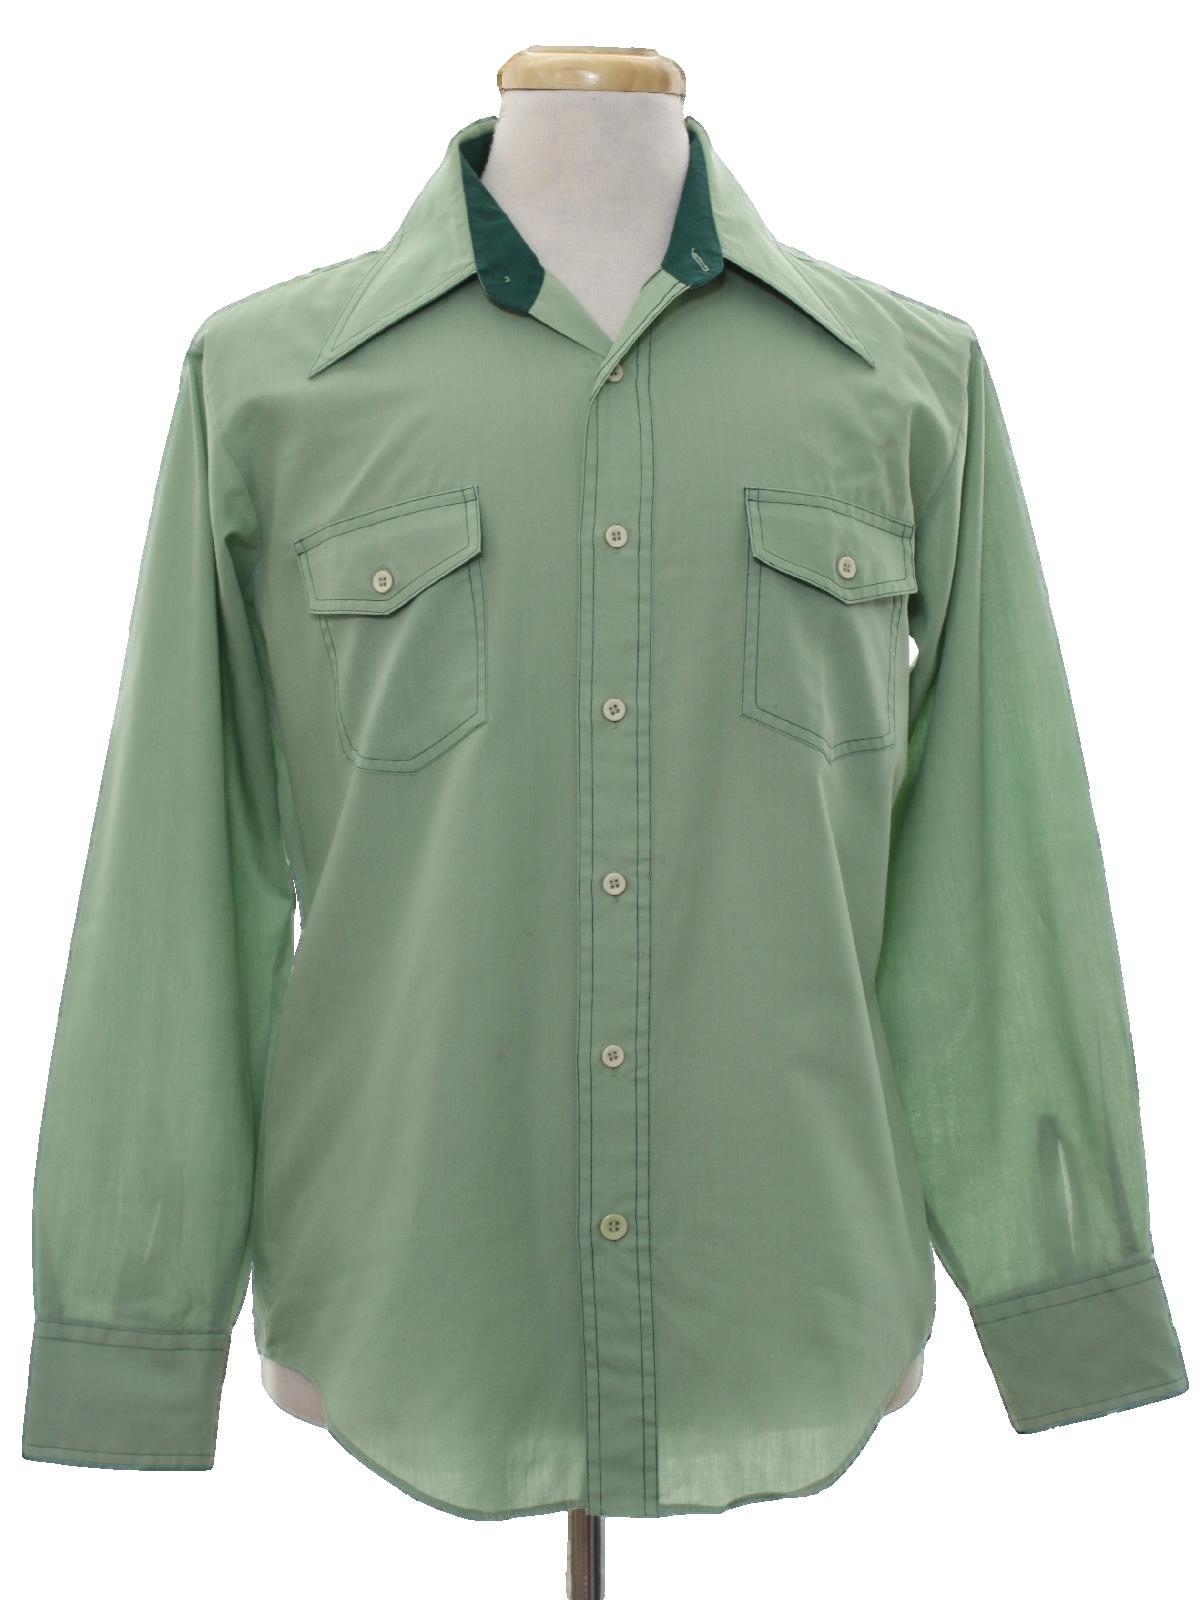 Vintage 1970 39 s shirt 70s kmart mens light avocado green for Kmart button up shirts